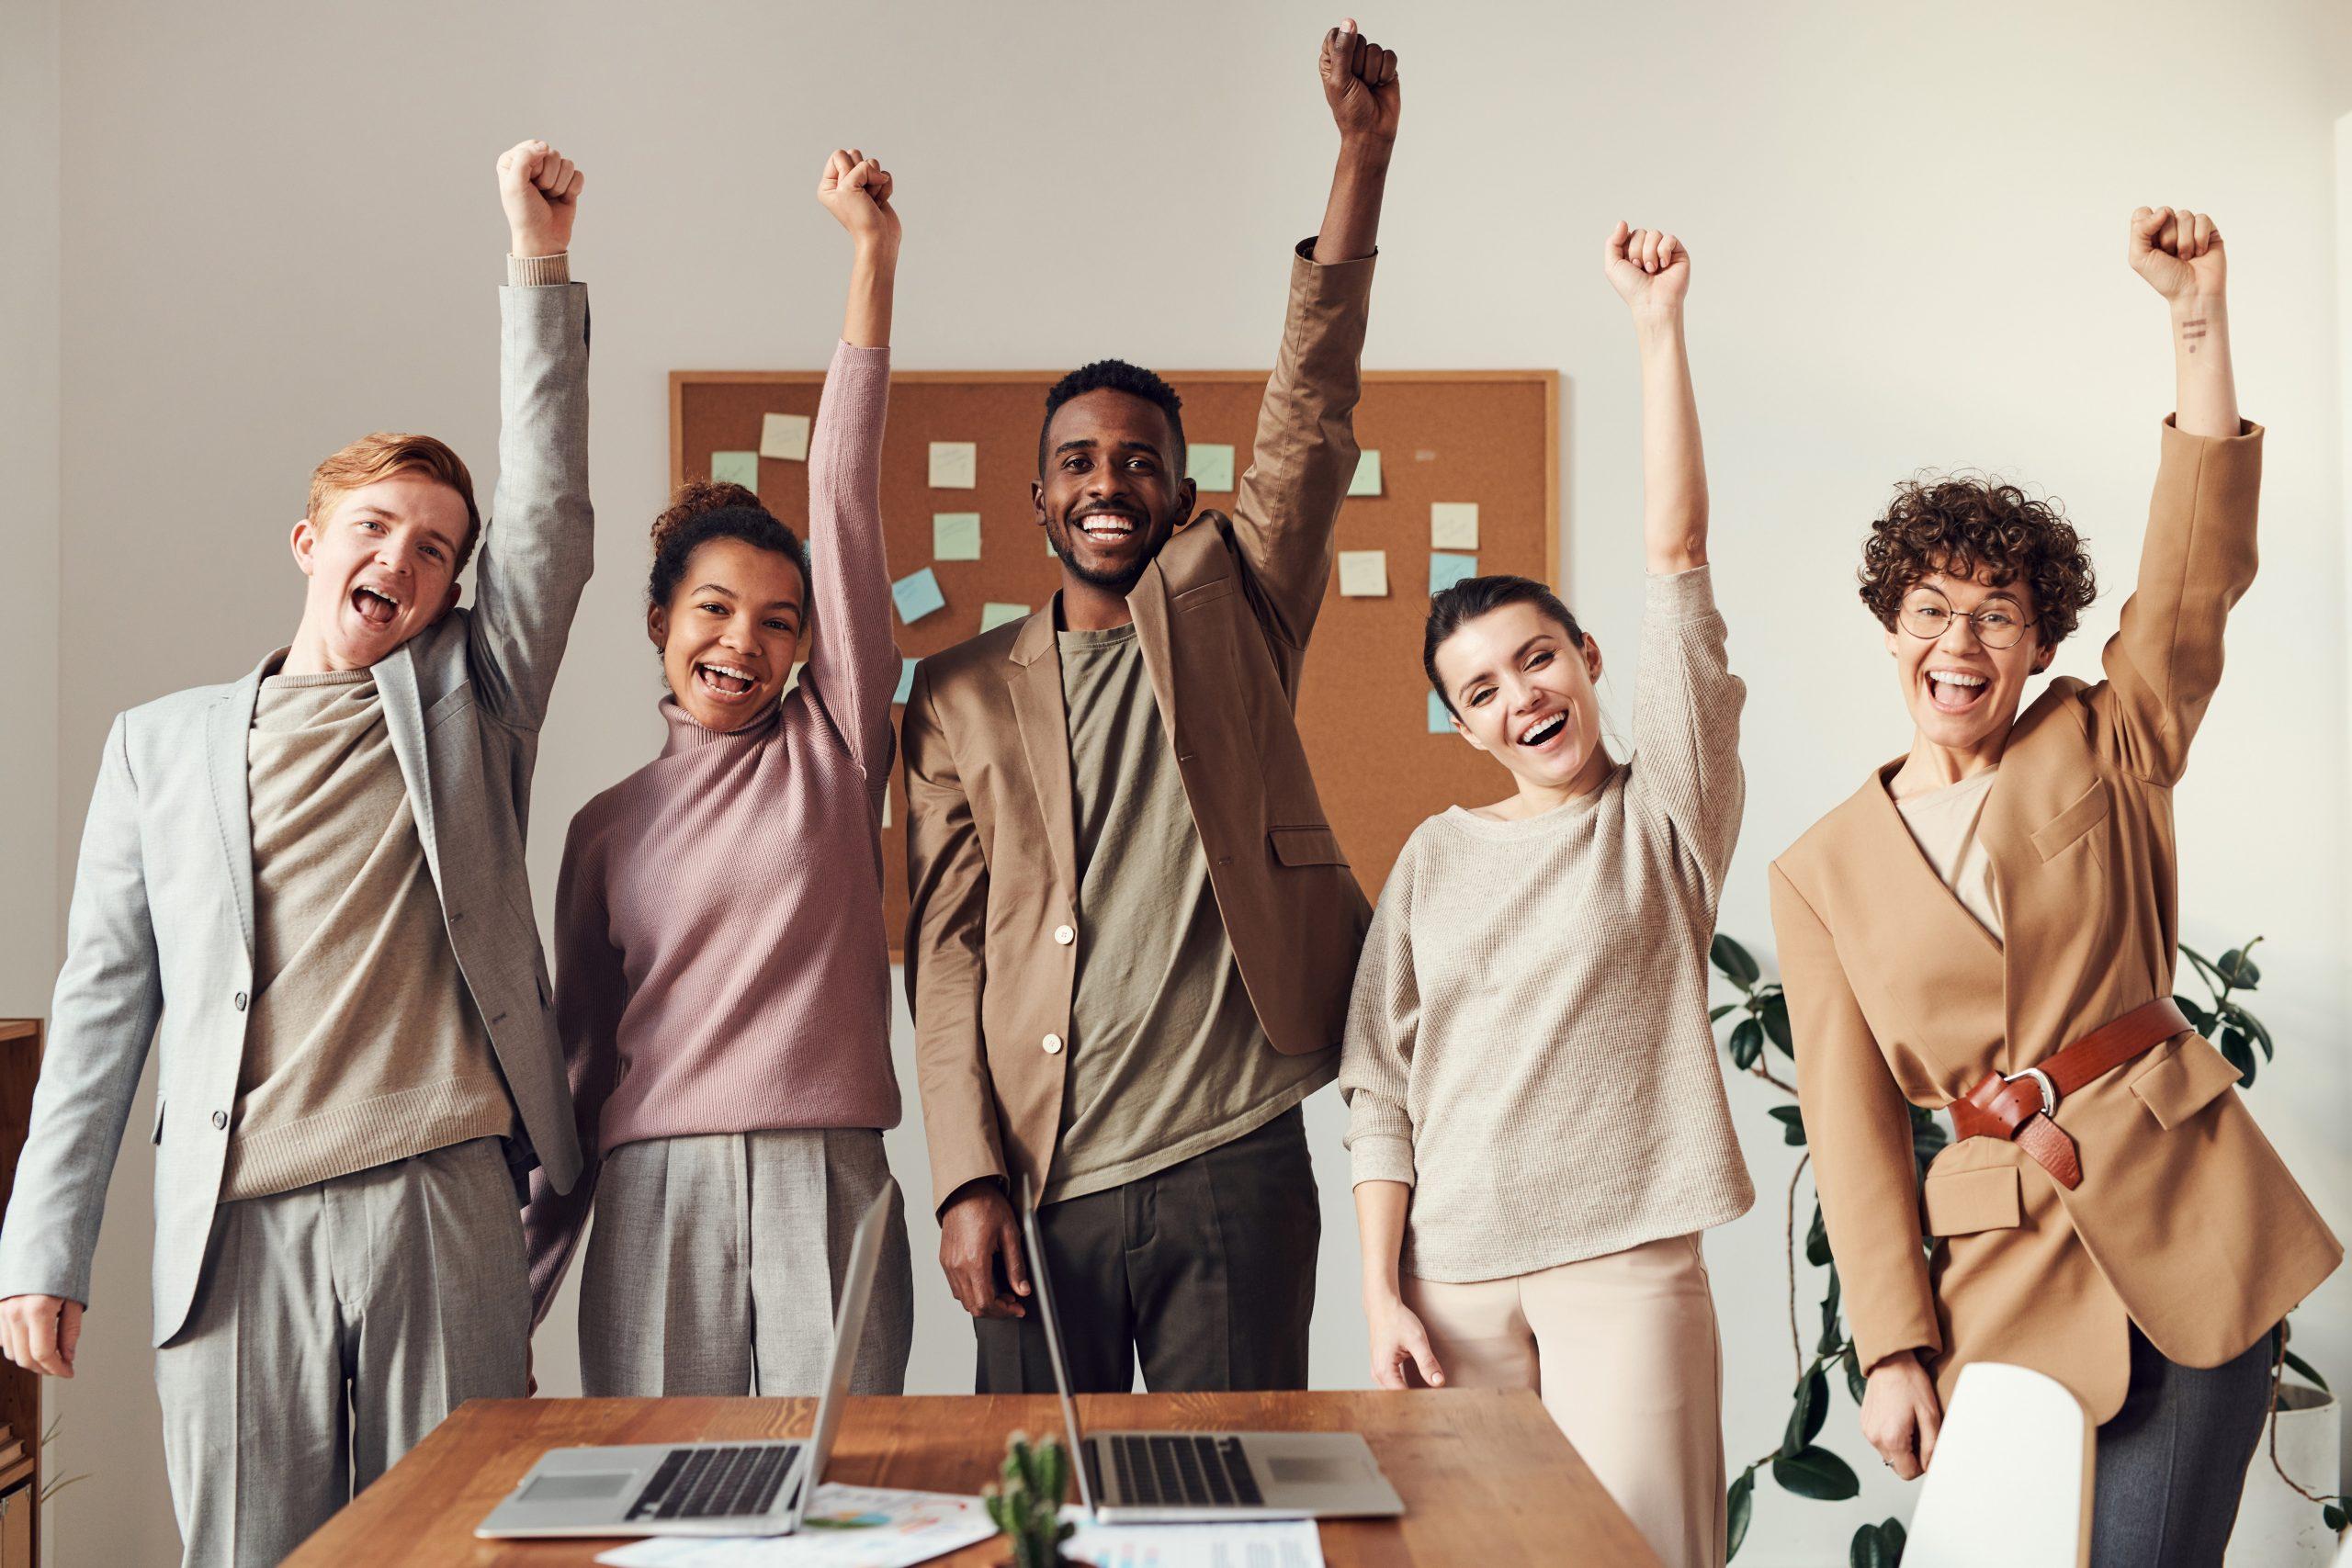 Workplace celebrations